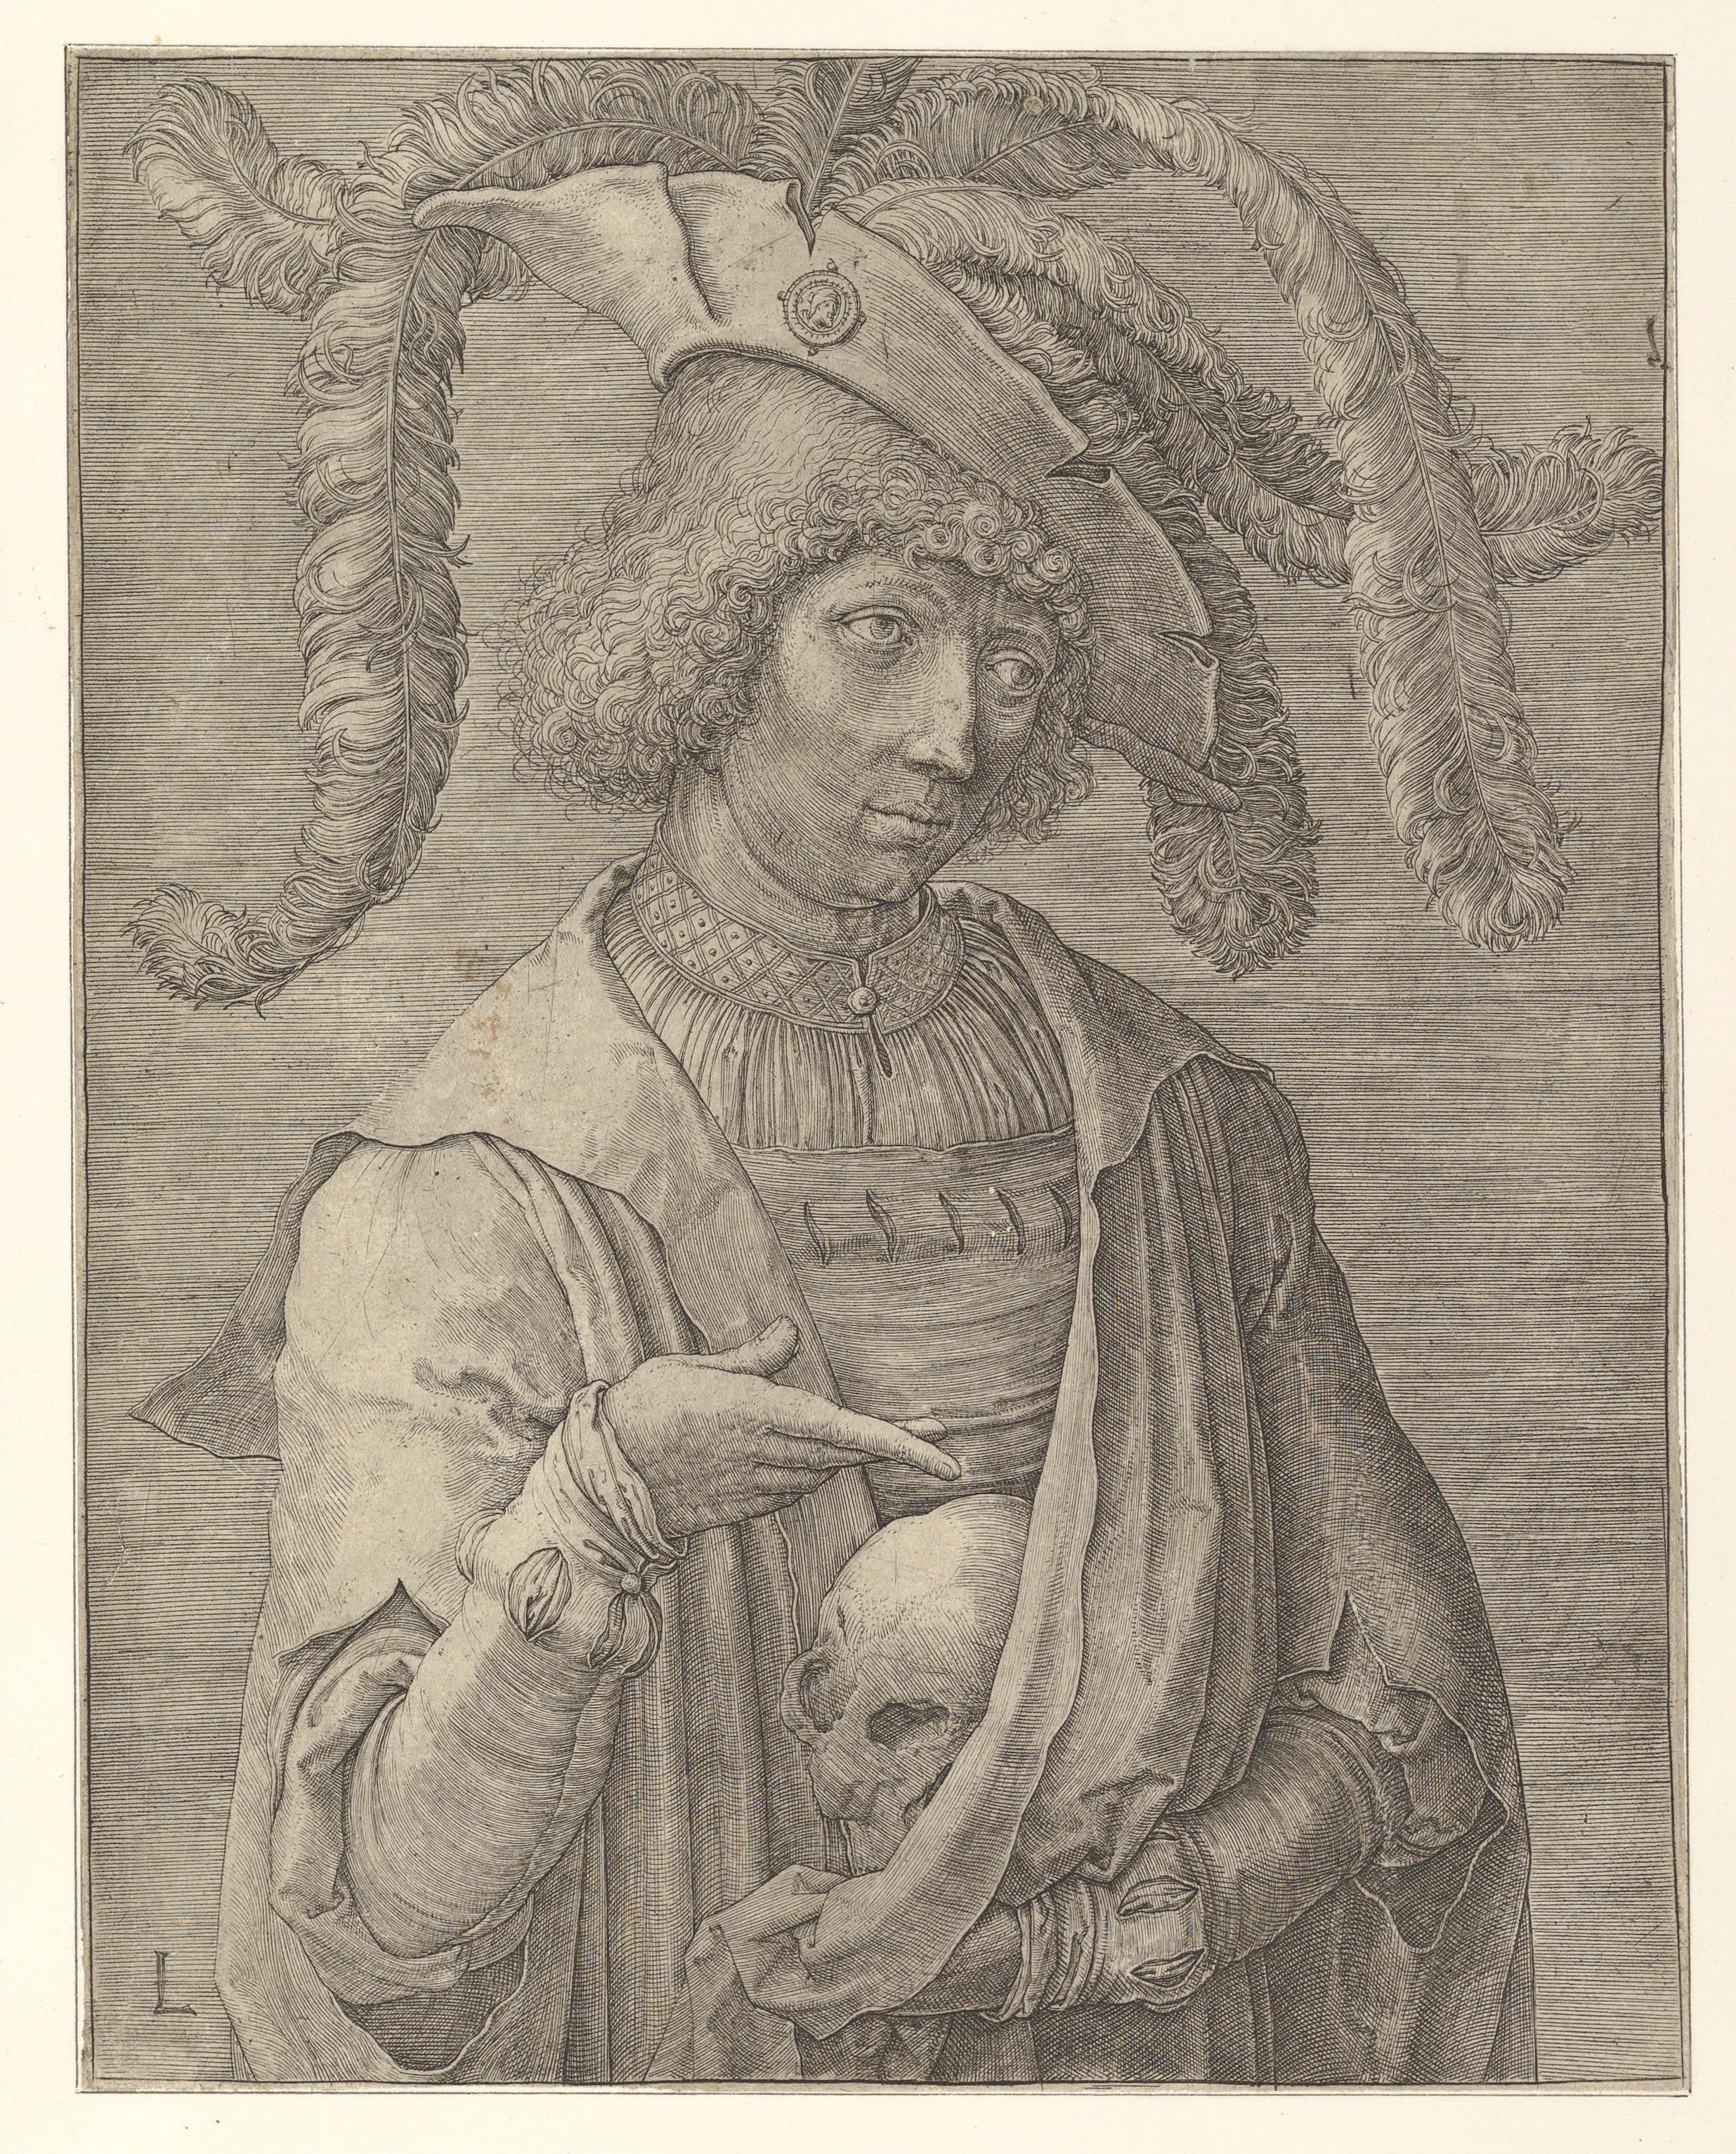 Lucas de Leyde 1519 ca Portrait d'un jeune homme MET